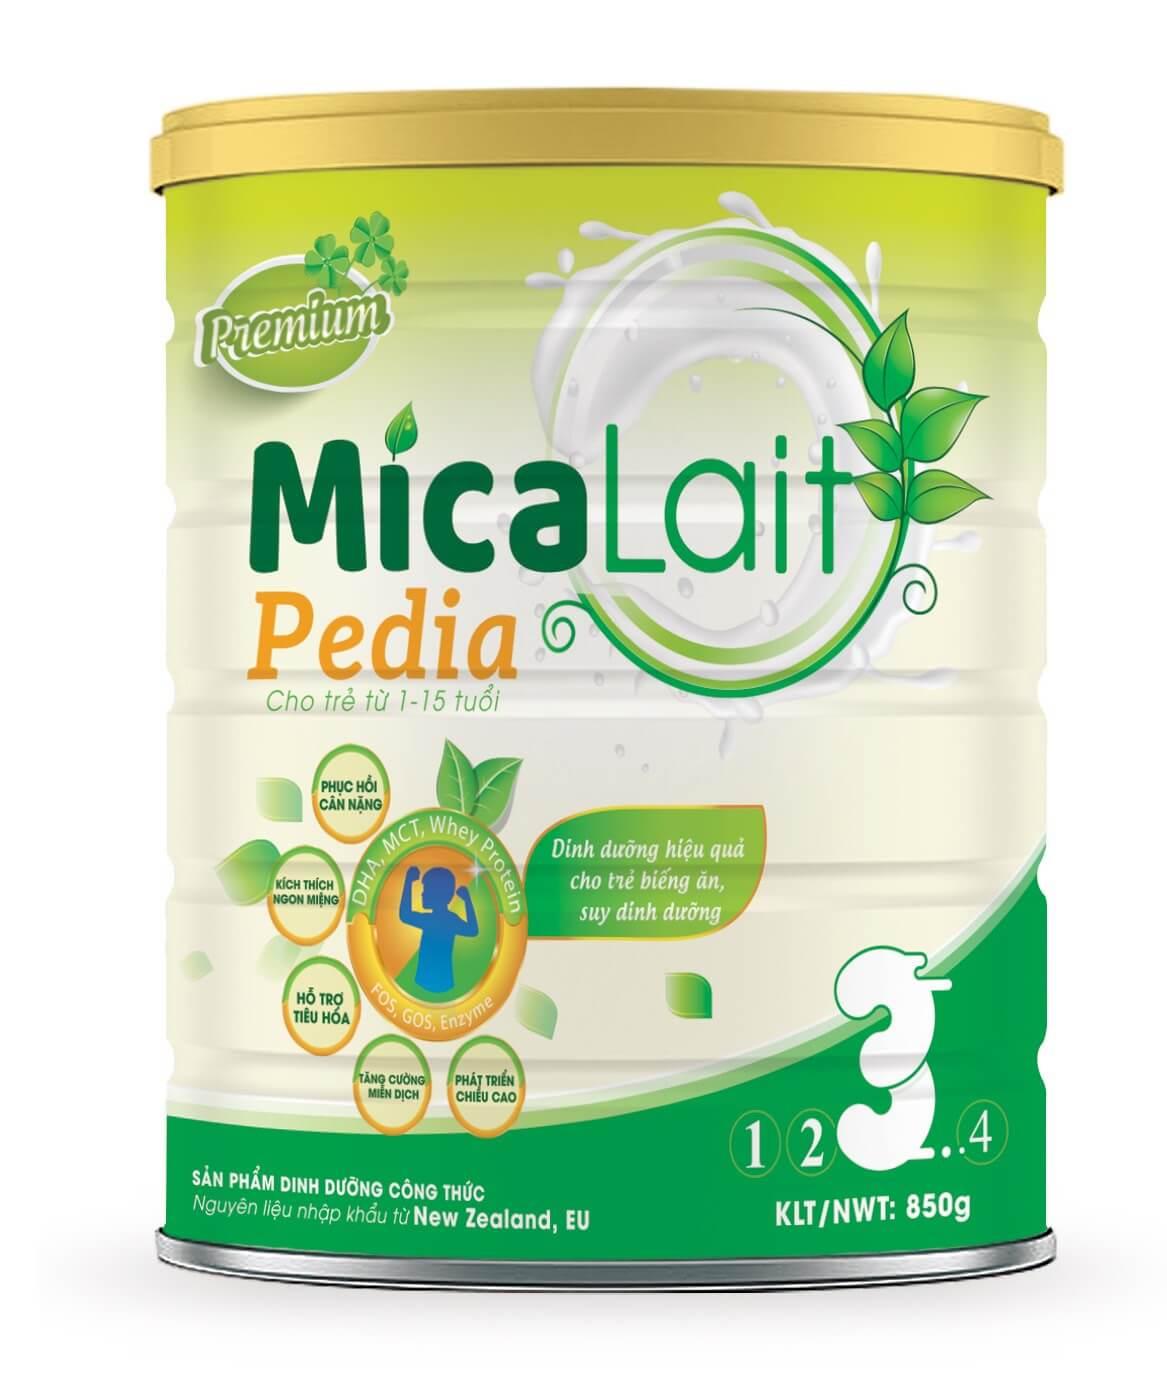 Sữa Micalait Pedia